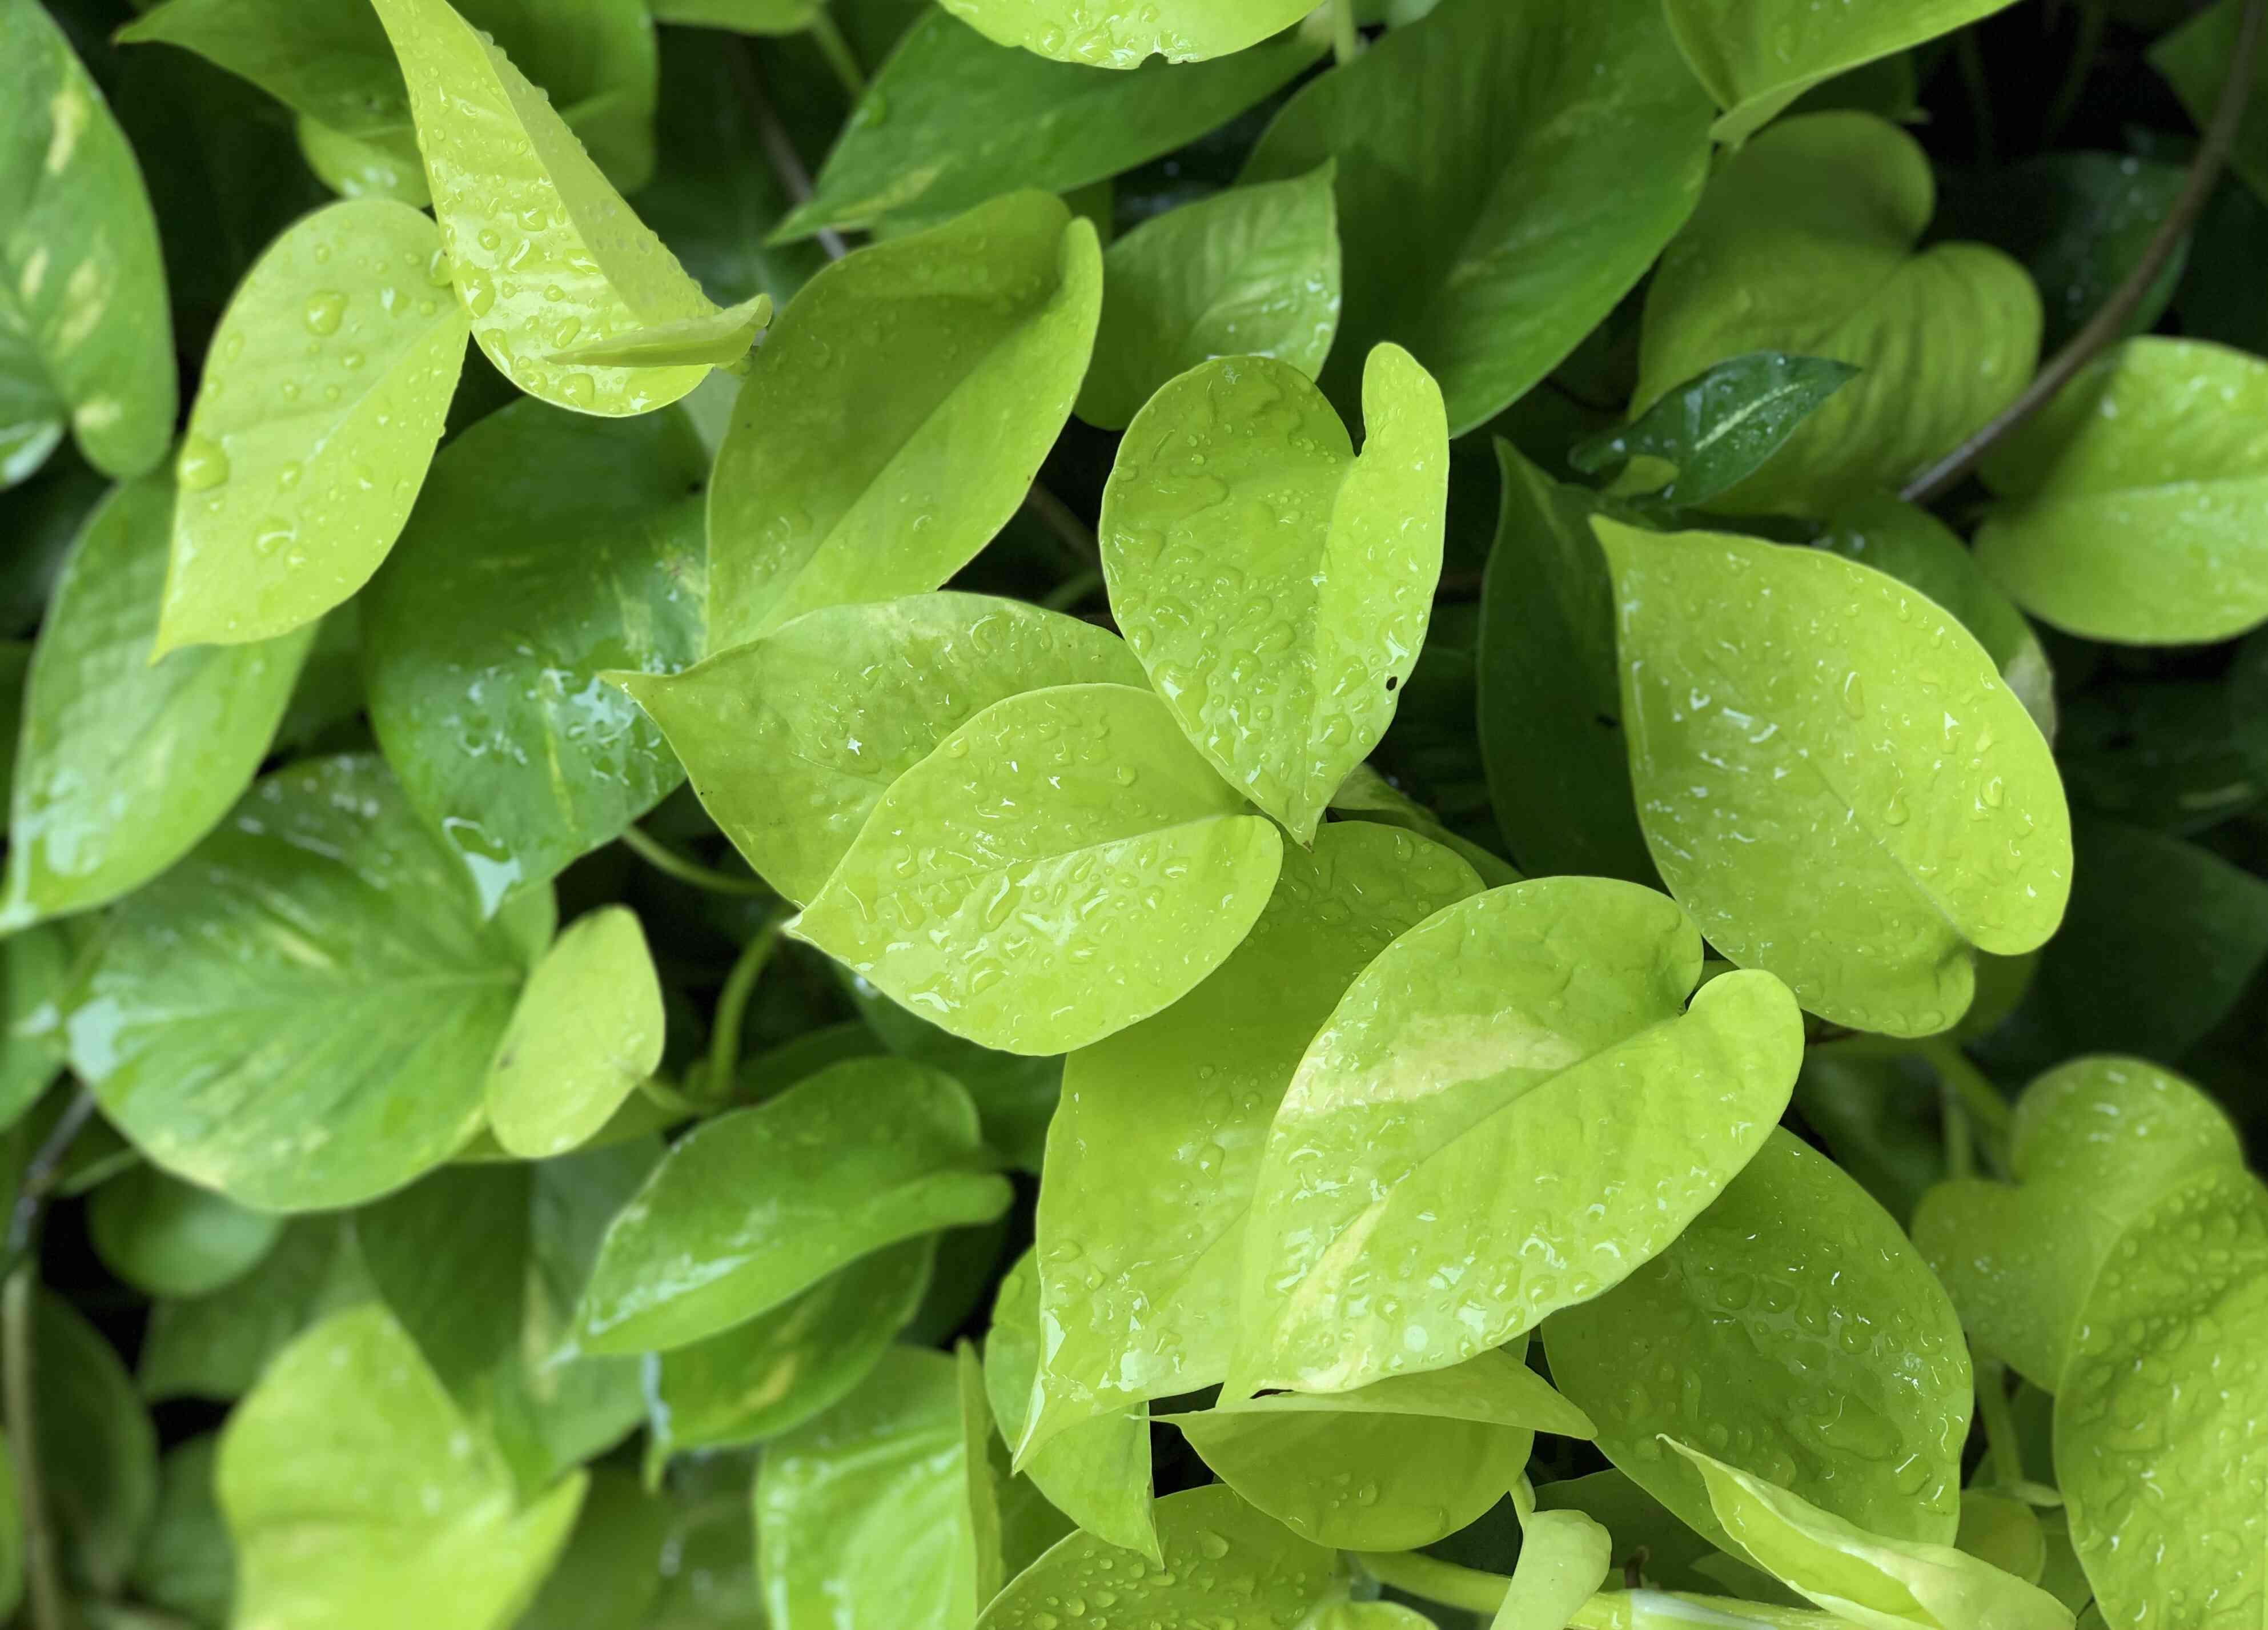 Green devil's ivy plants at raining season.